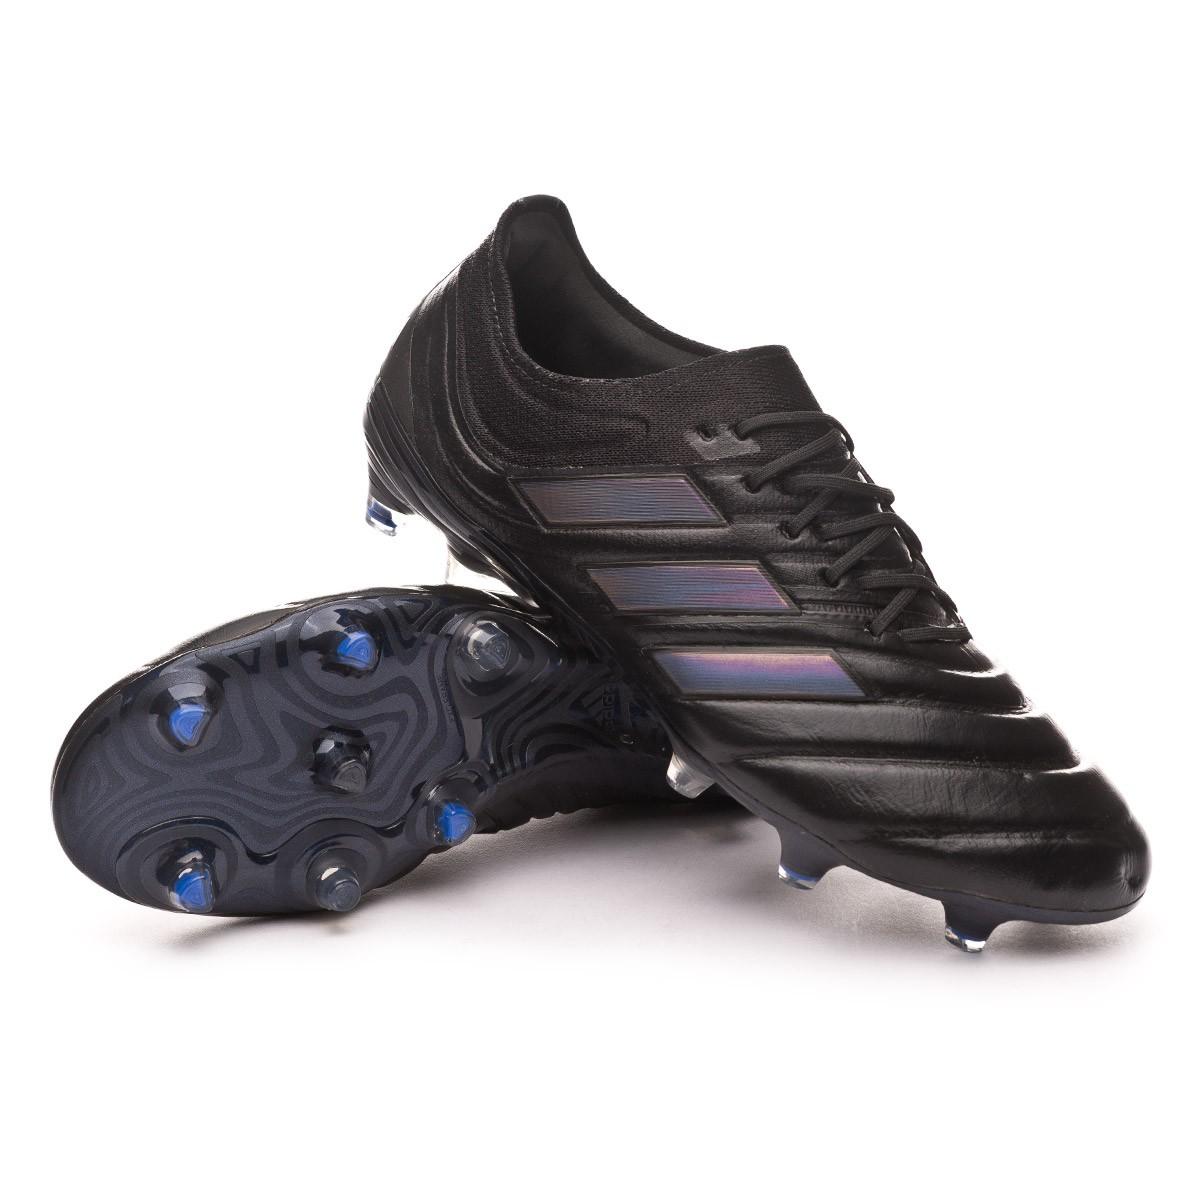 adidas Copa 19.1 FG – Initiator Pack